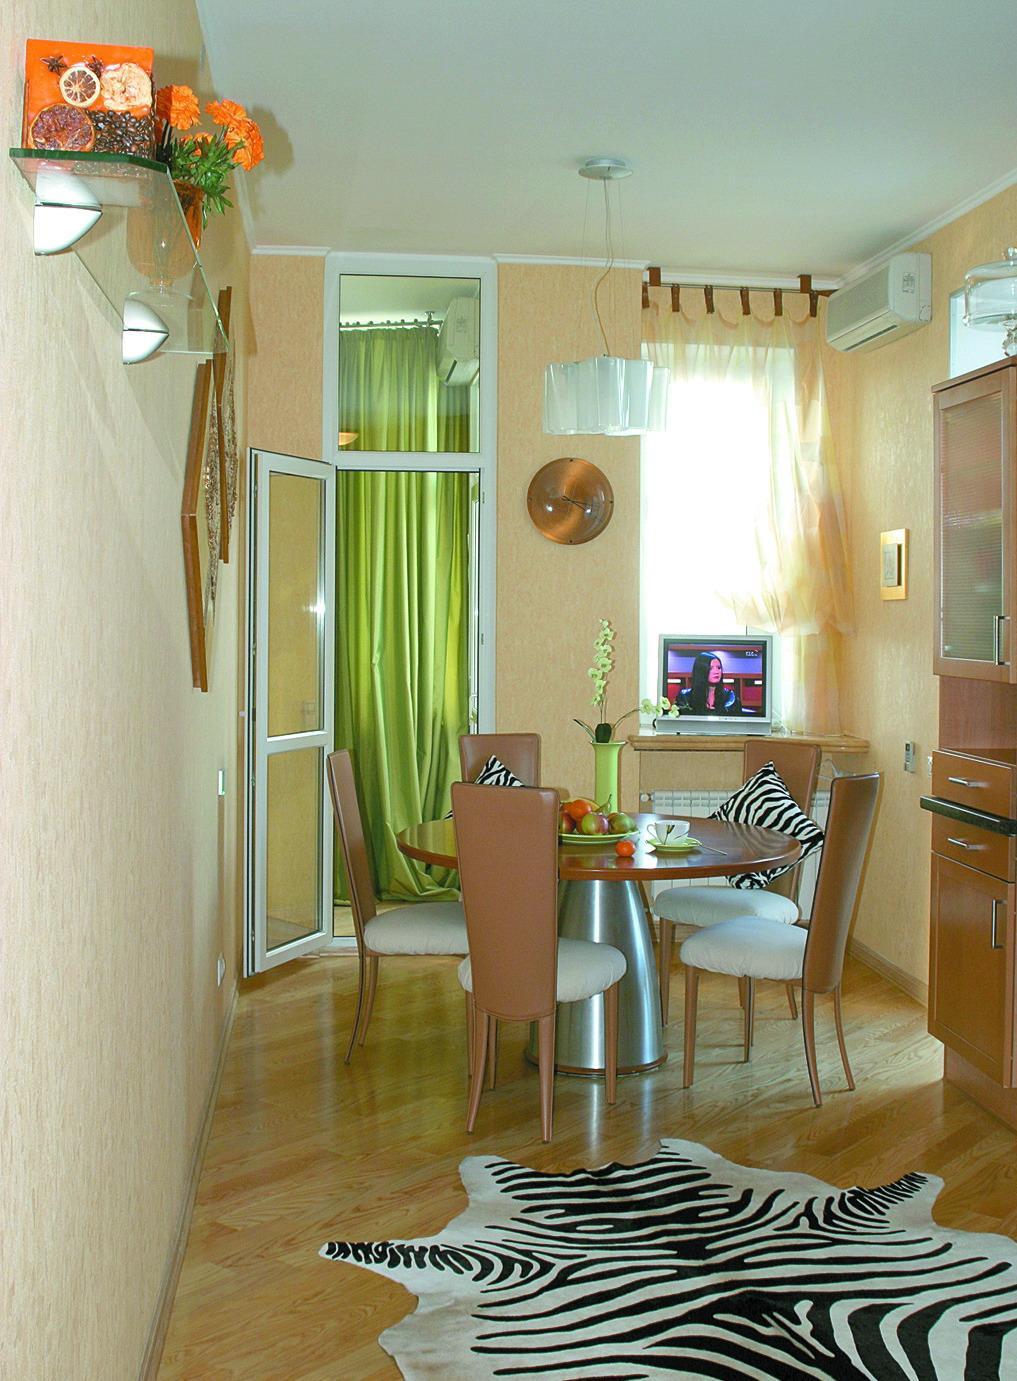 3-к квартира | Краснодар, Кубанская, р-н ЧМР, 52 фото - 1